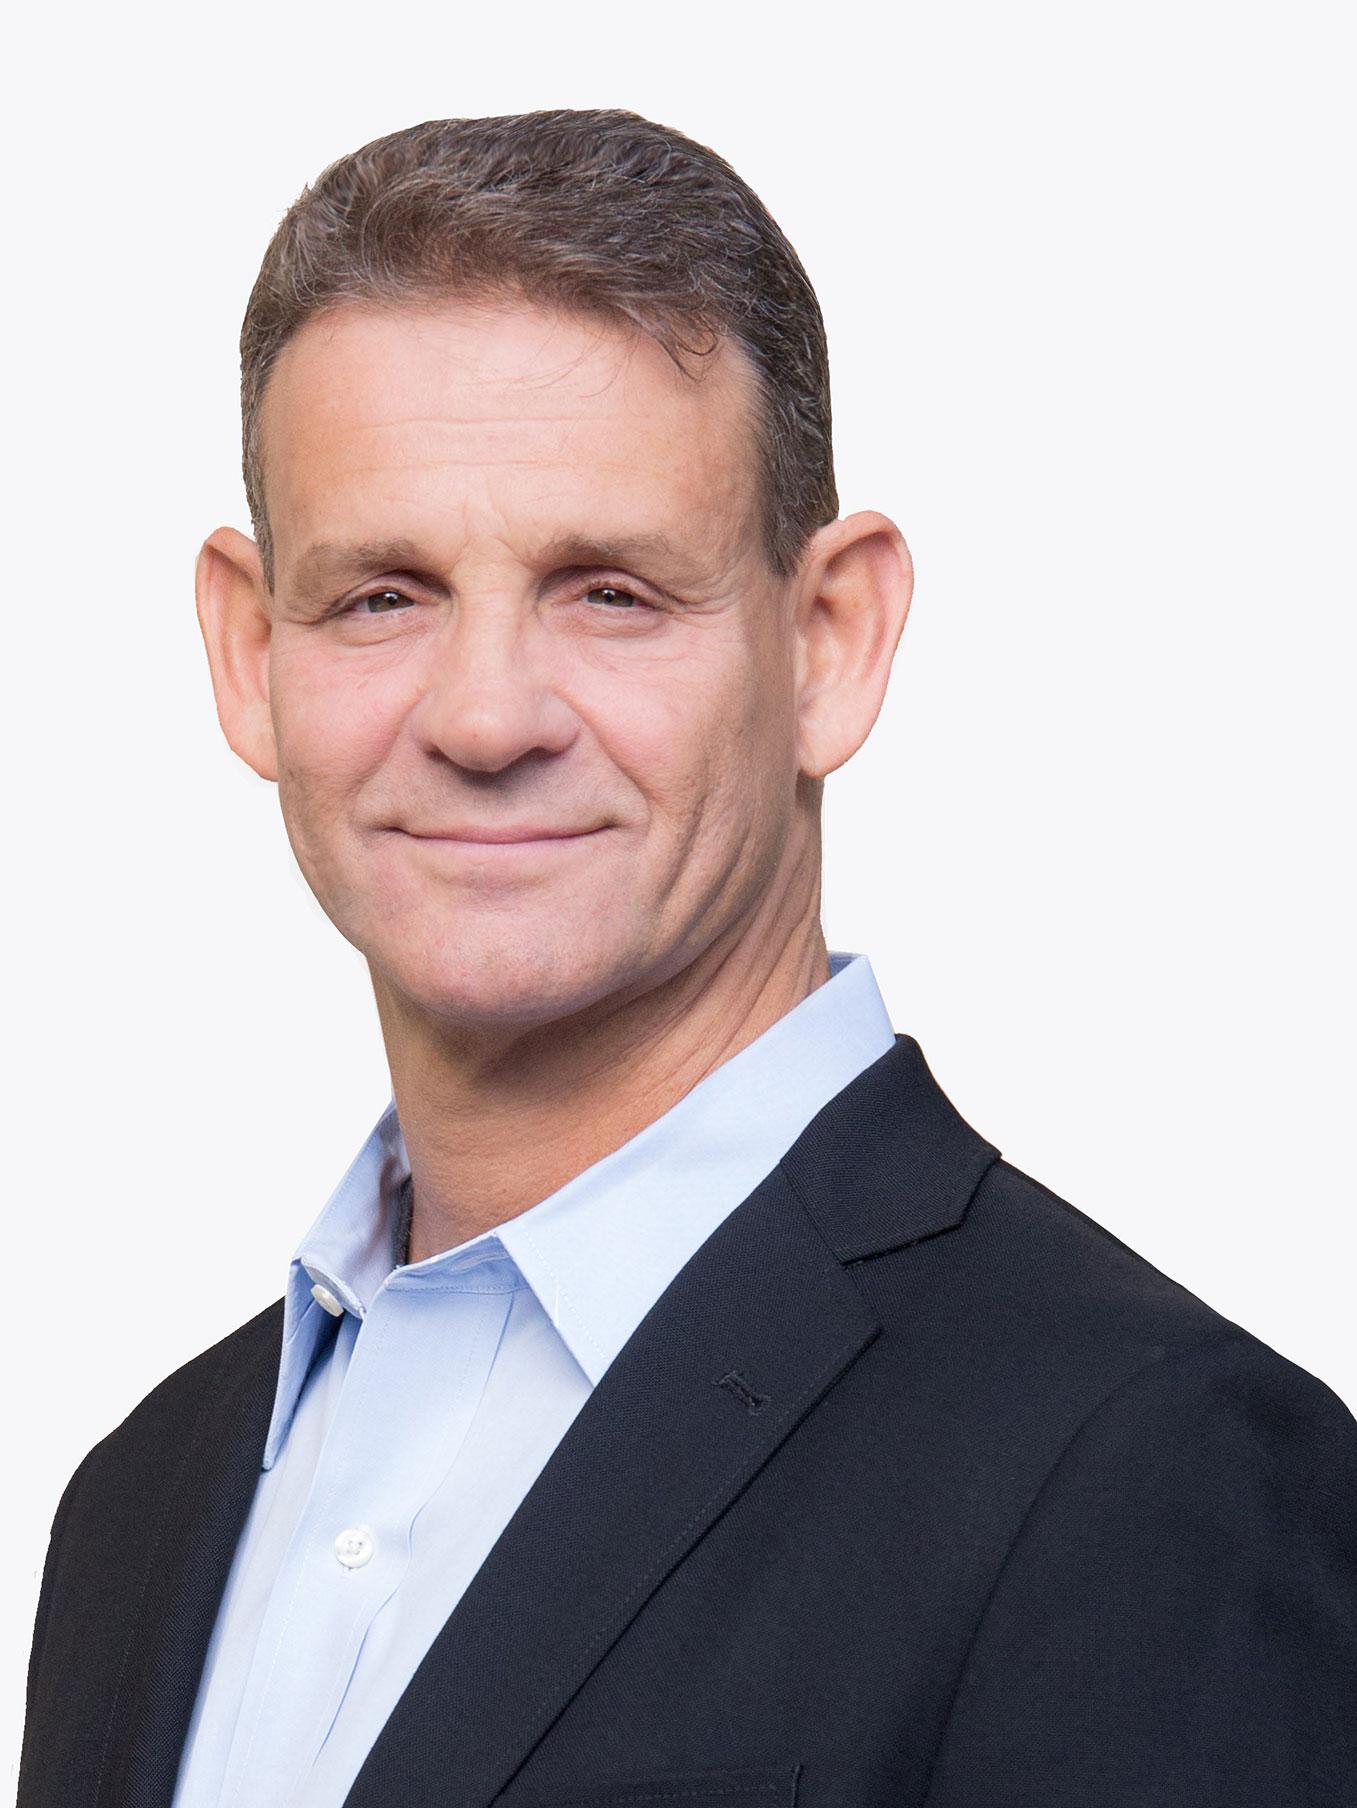 Daniel Rosenberg, National Sales Director of Day Hagan Asset Management in Sarasota, FL.